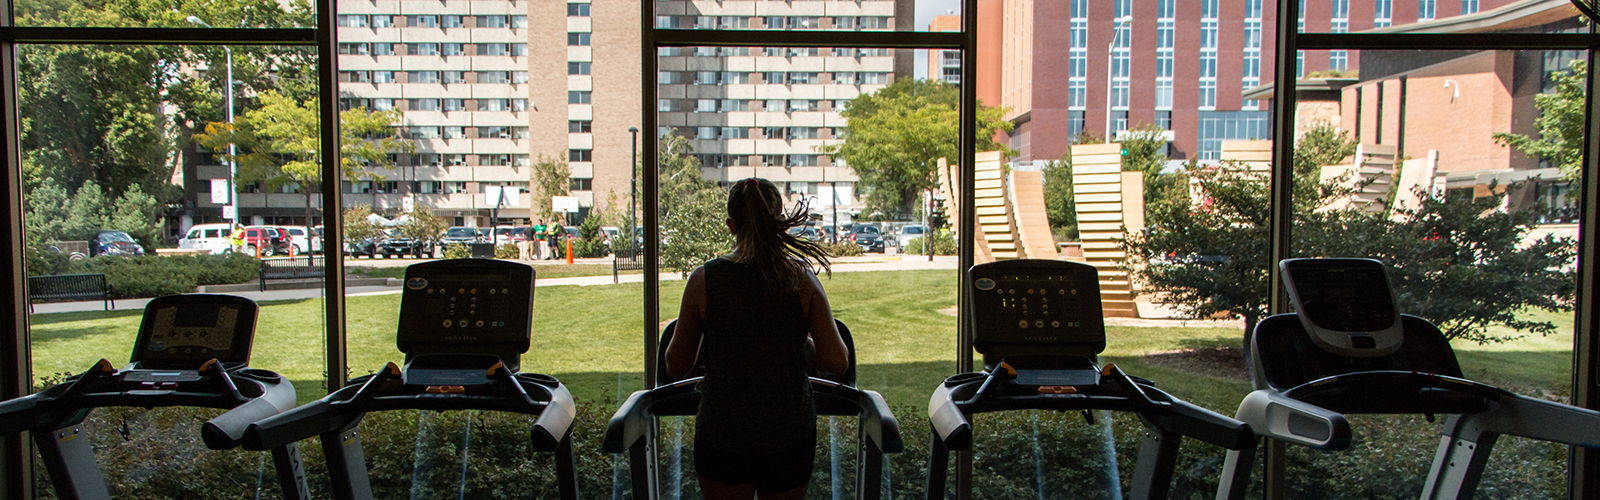 Woman running on treadmill at Ogg Hall Fitness Center